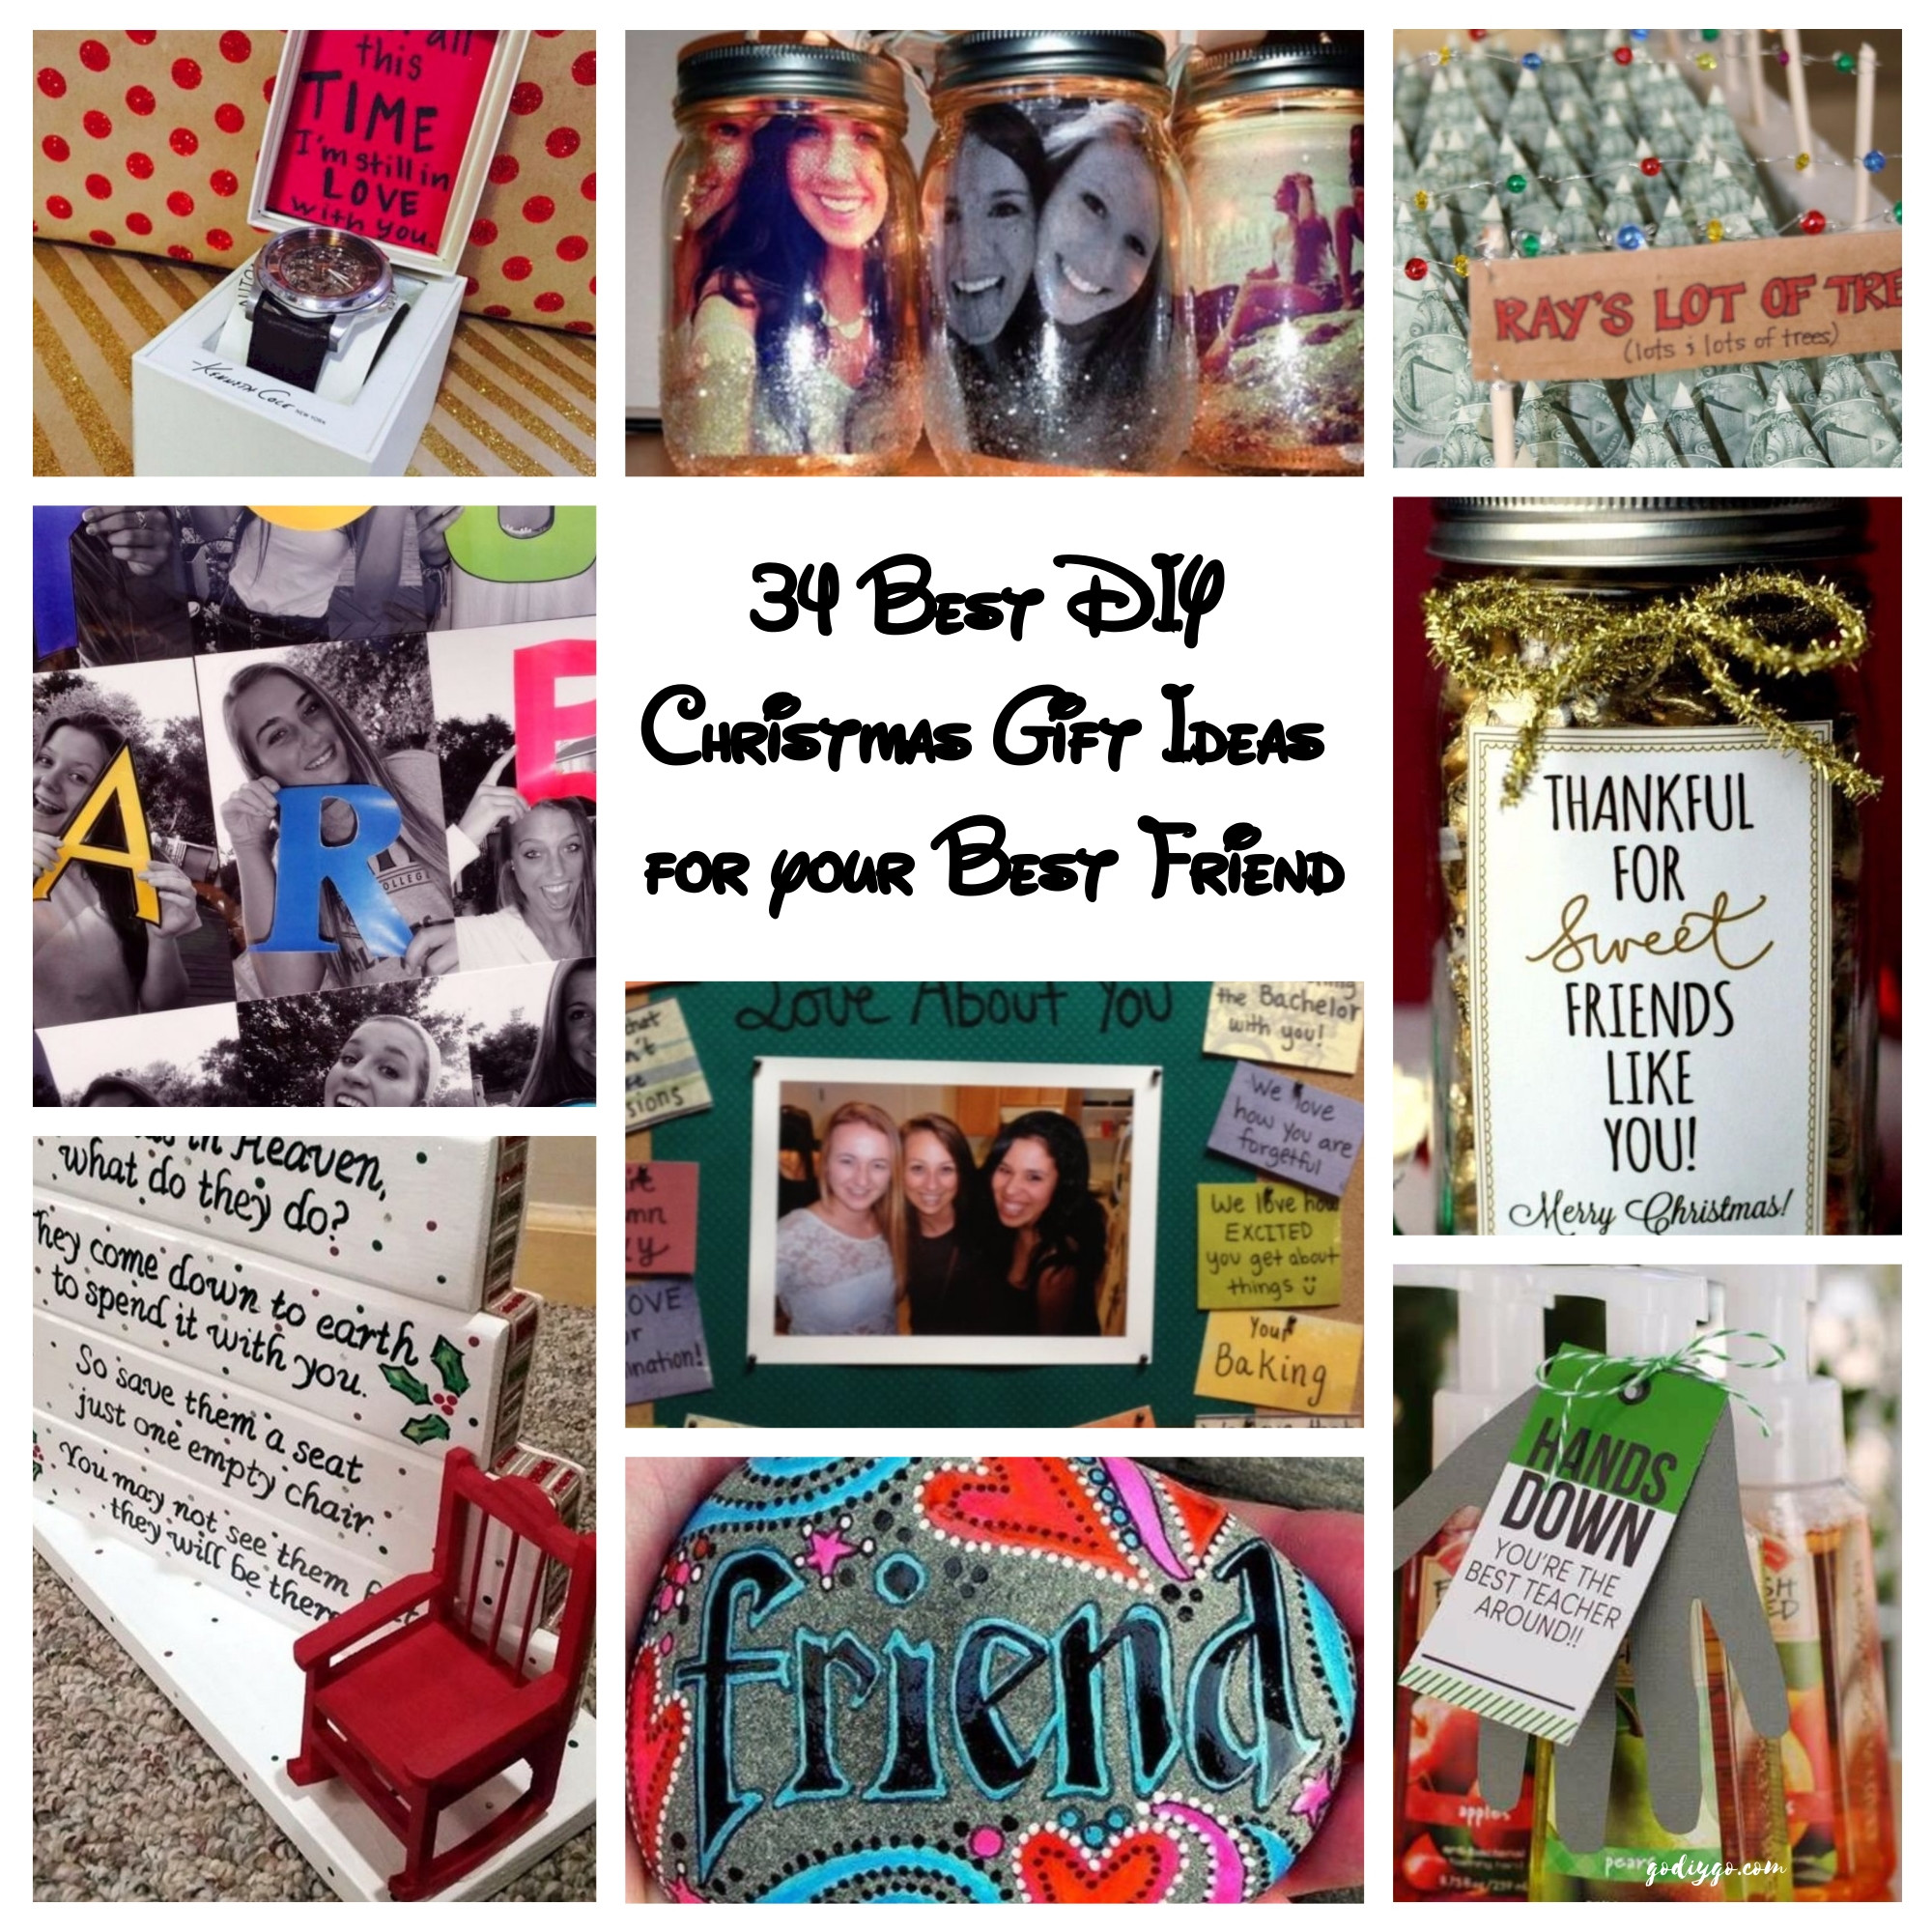 Diy Gift Ideas For Best Friend  34 Best DIY Christmas Gift Ideas for your Best Friend